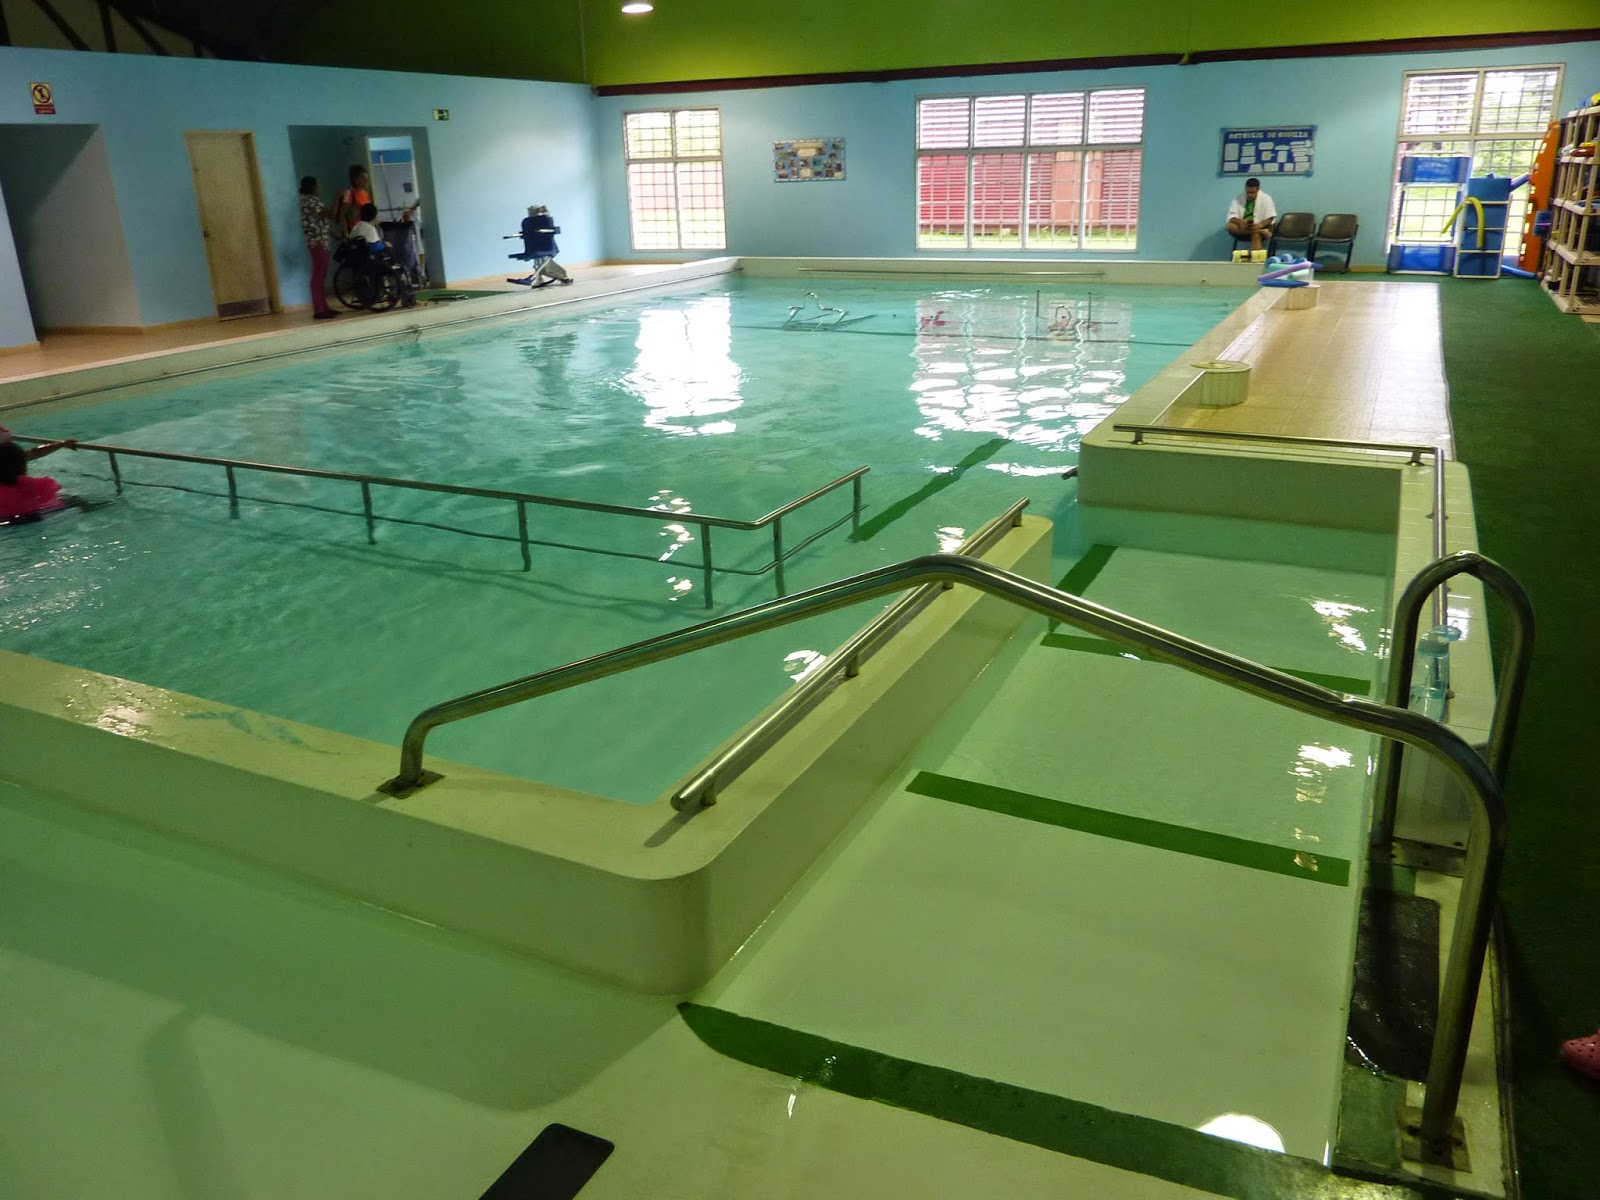 Rehabilitaci n f sica running in panama for Rehabilitacion en piscina